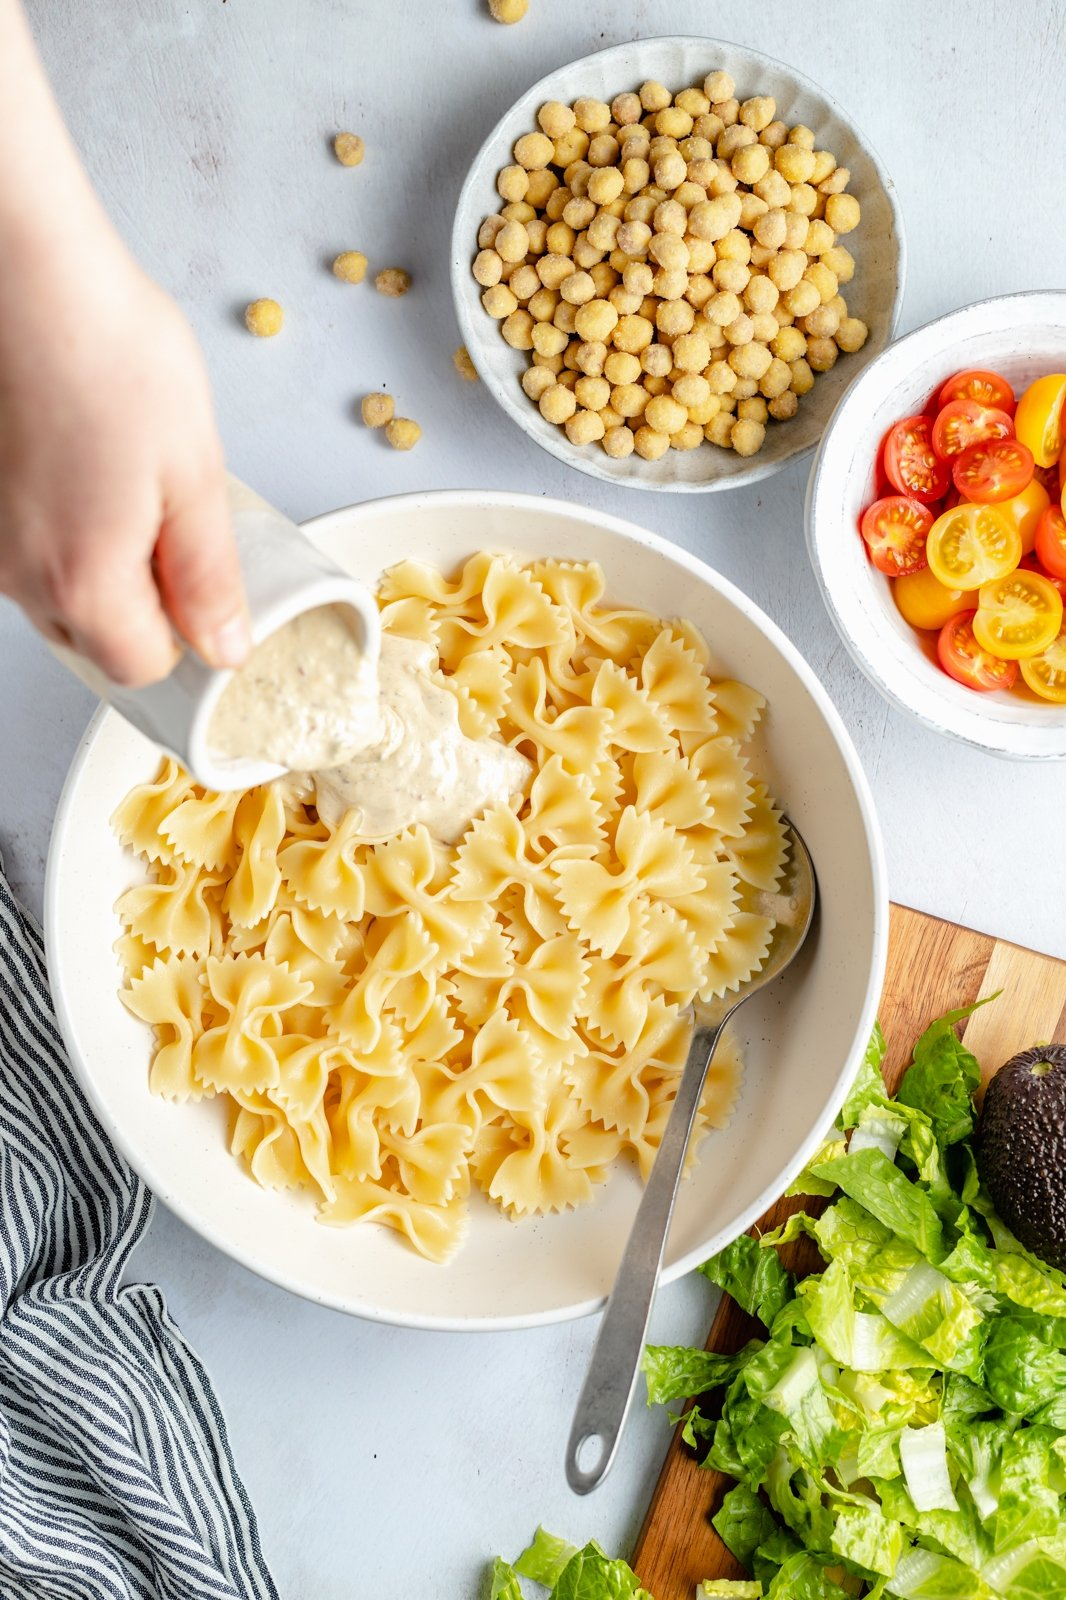 pouring dressing into a bowl of pasta for vegan caesar pasta salad